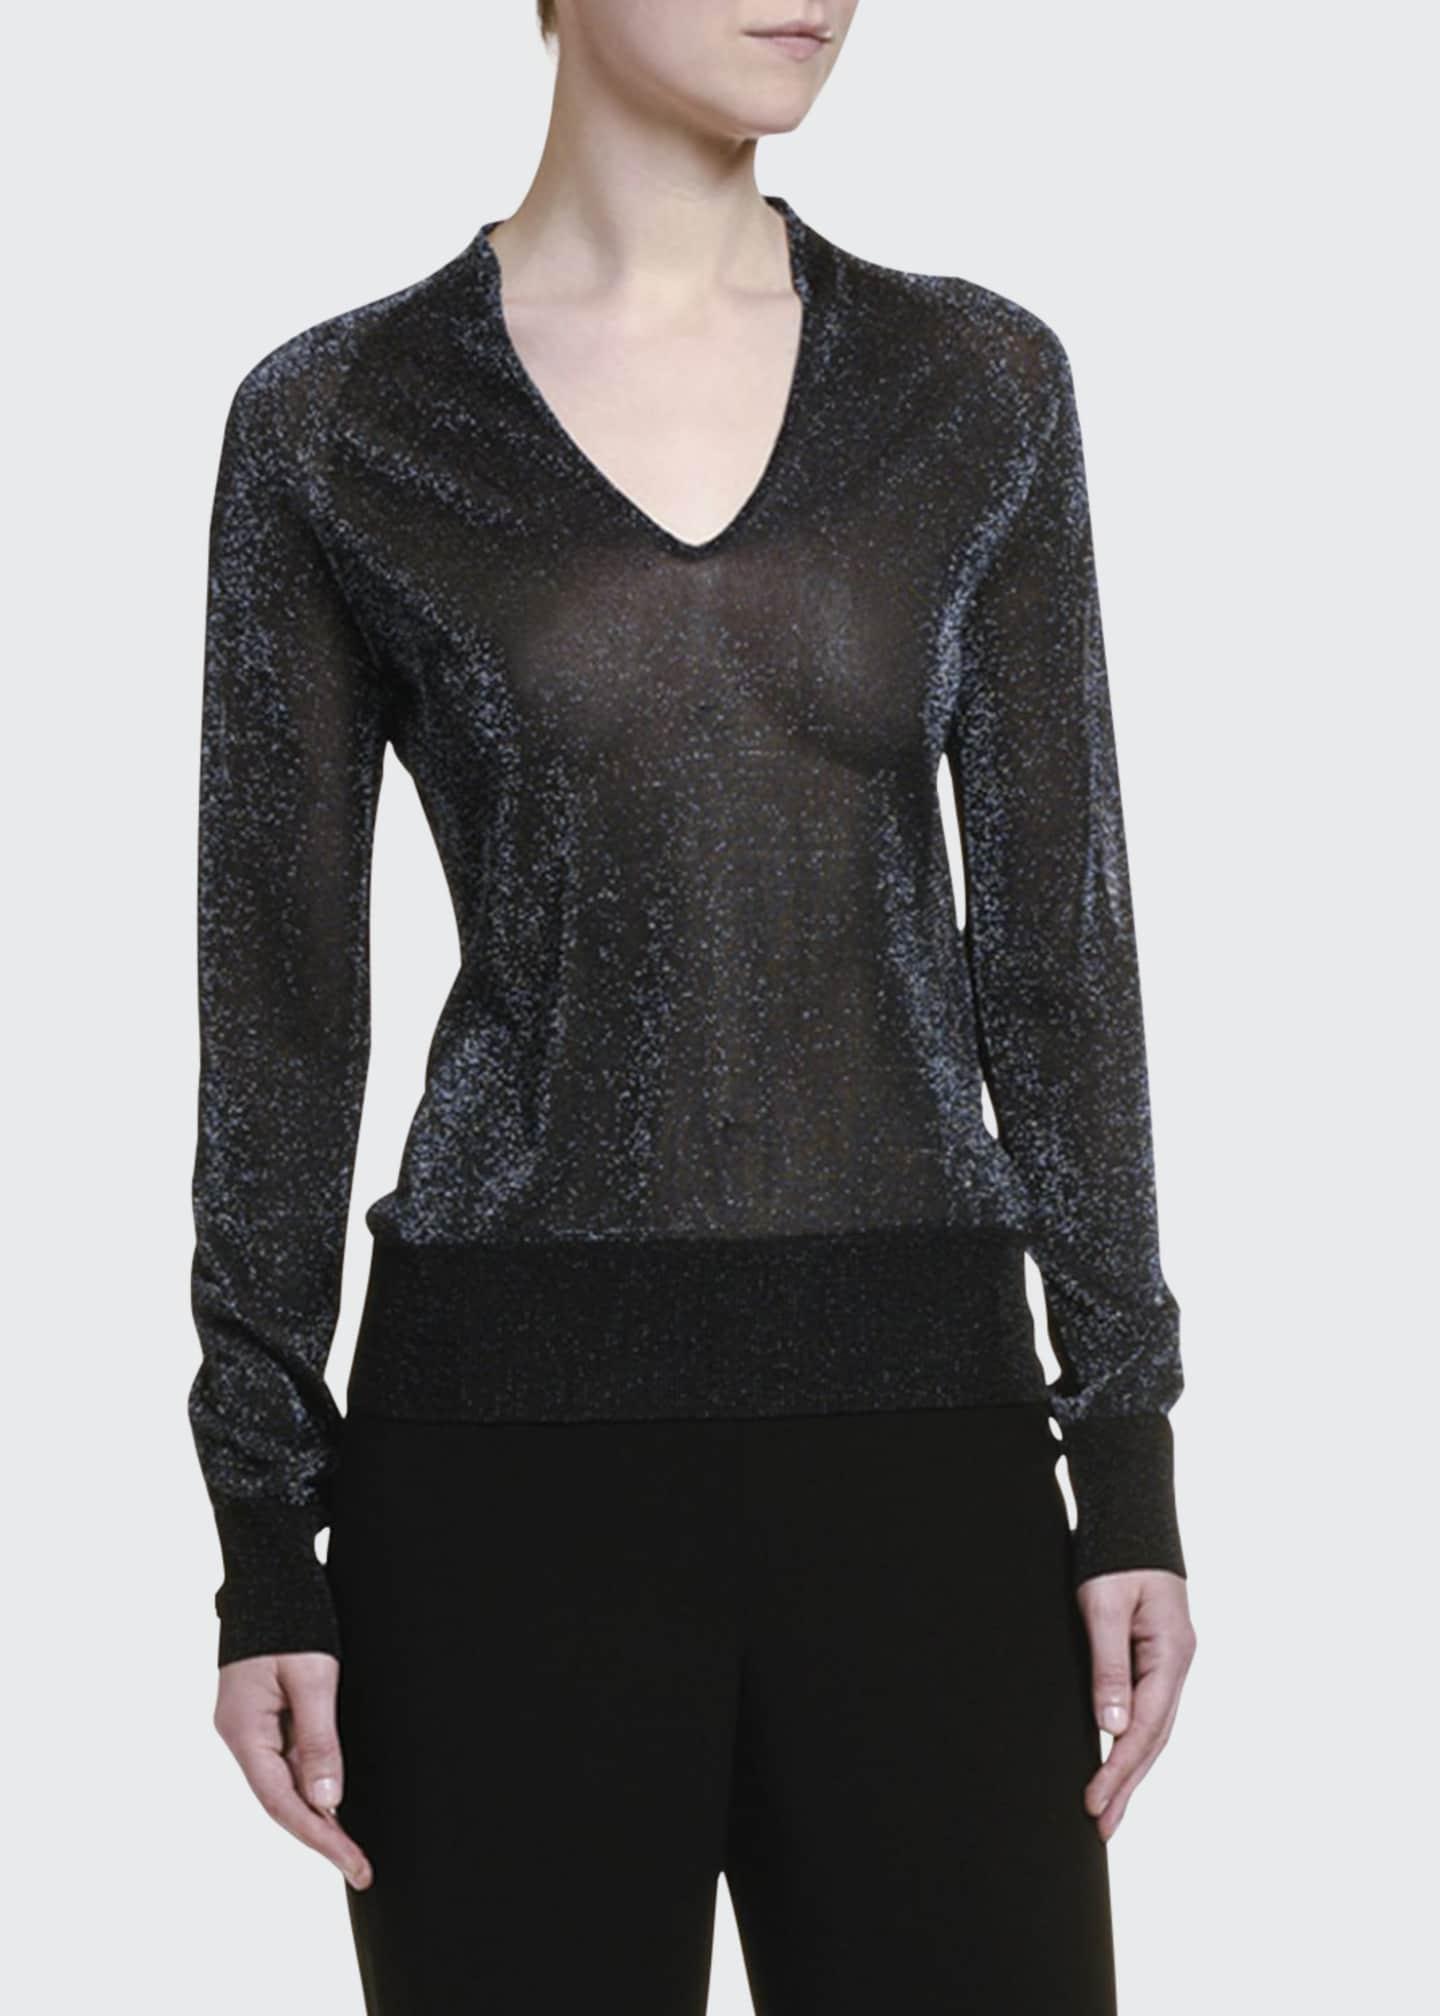 Giorgio Armani Shimmered V-Neck Sweater